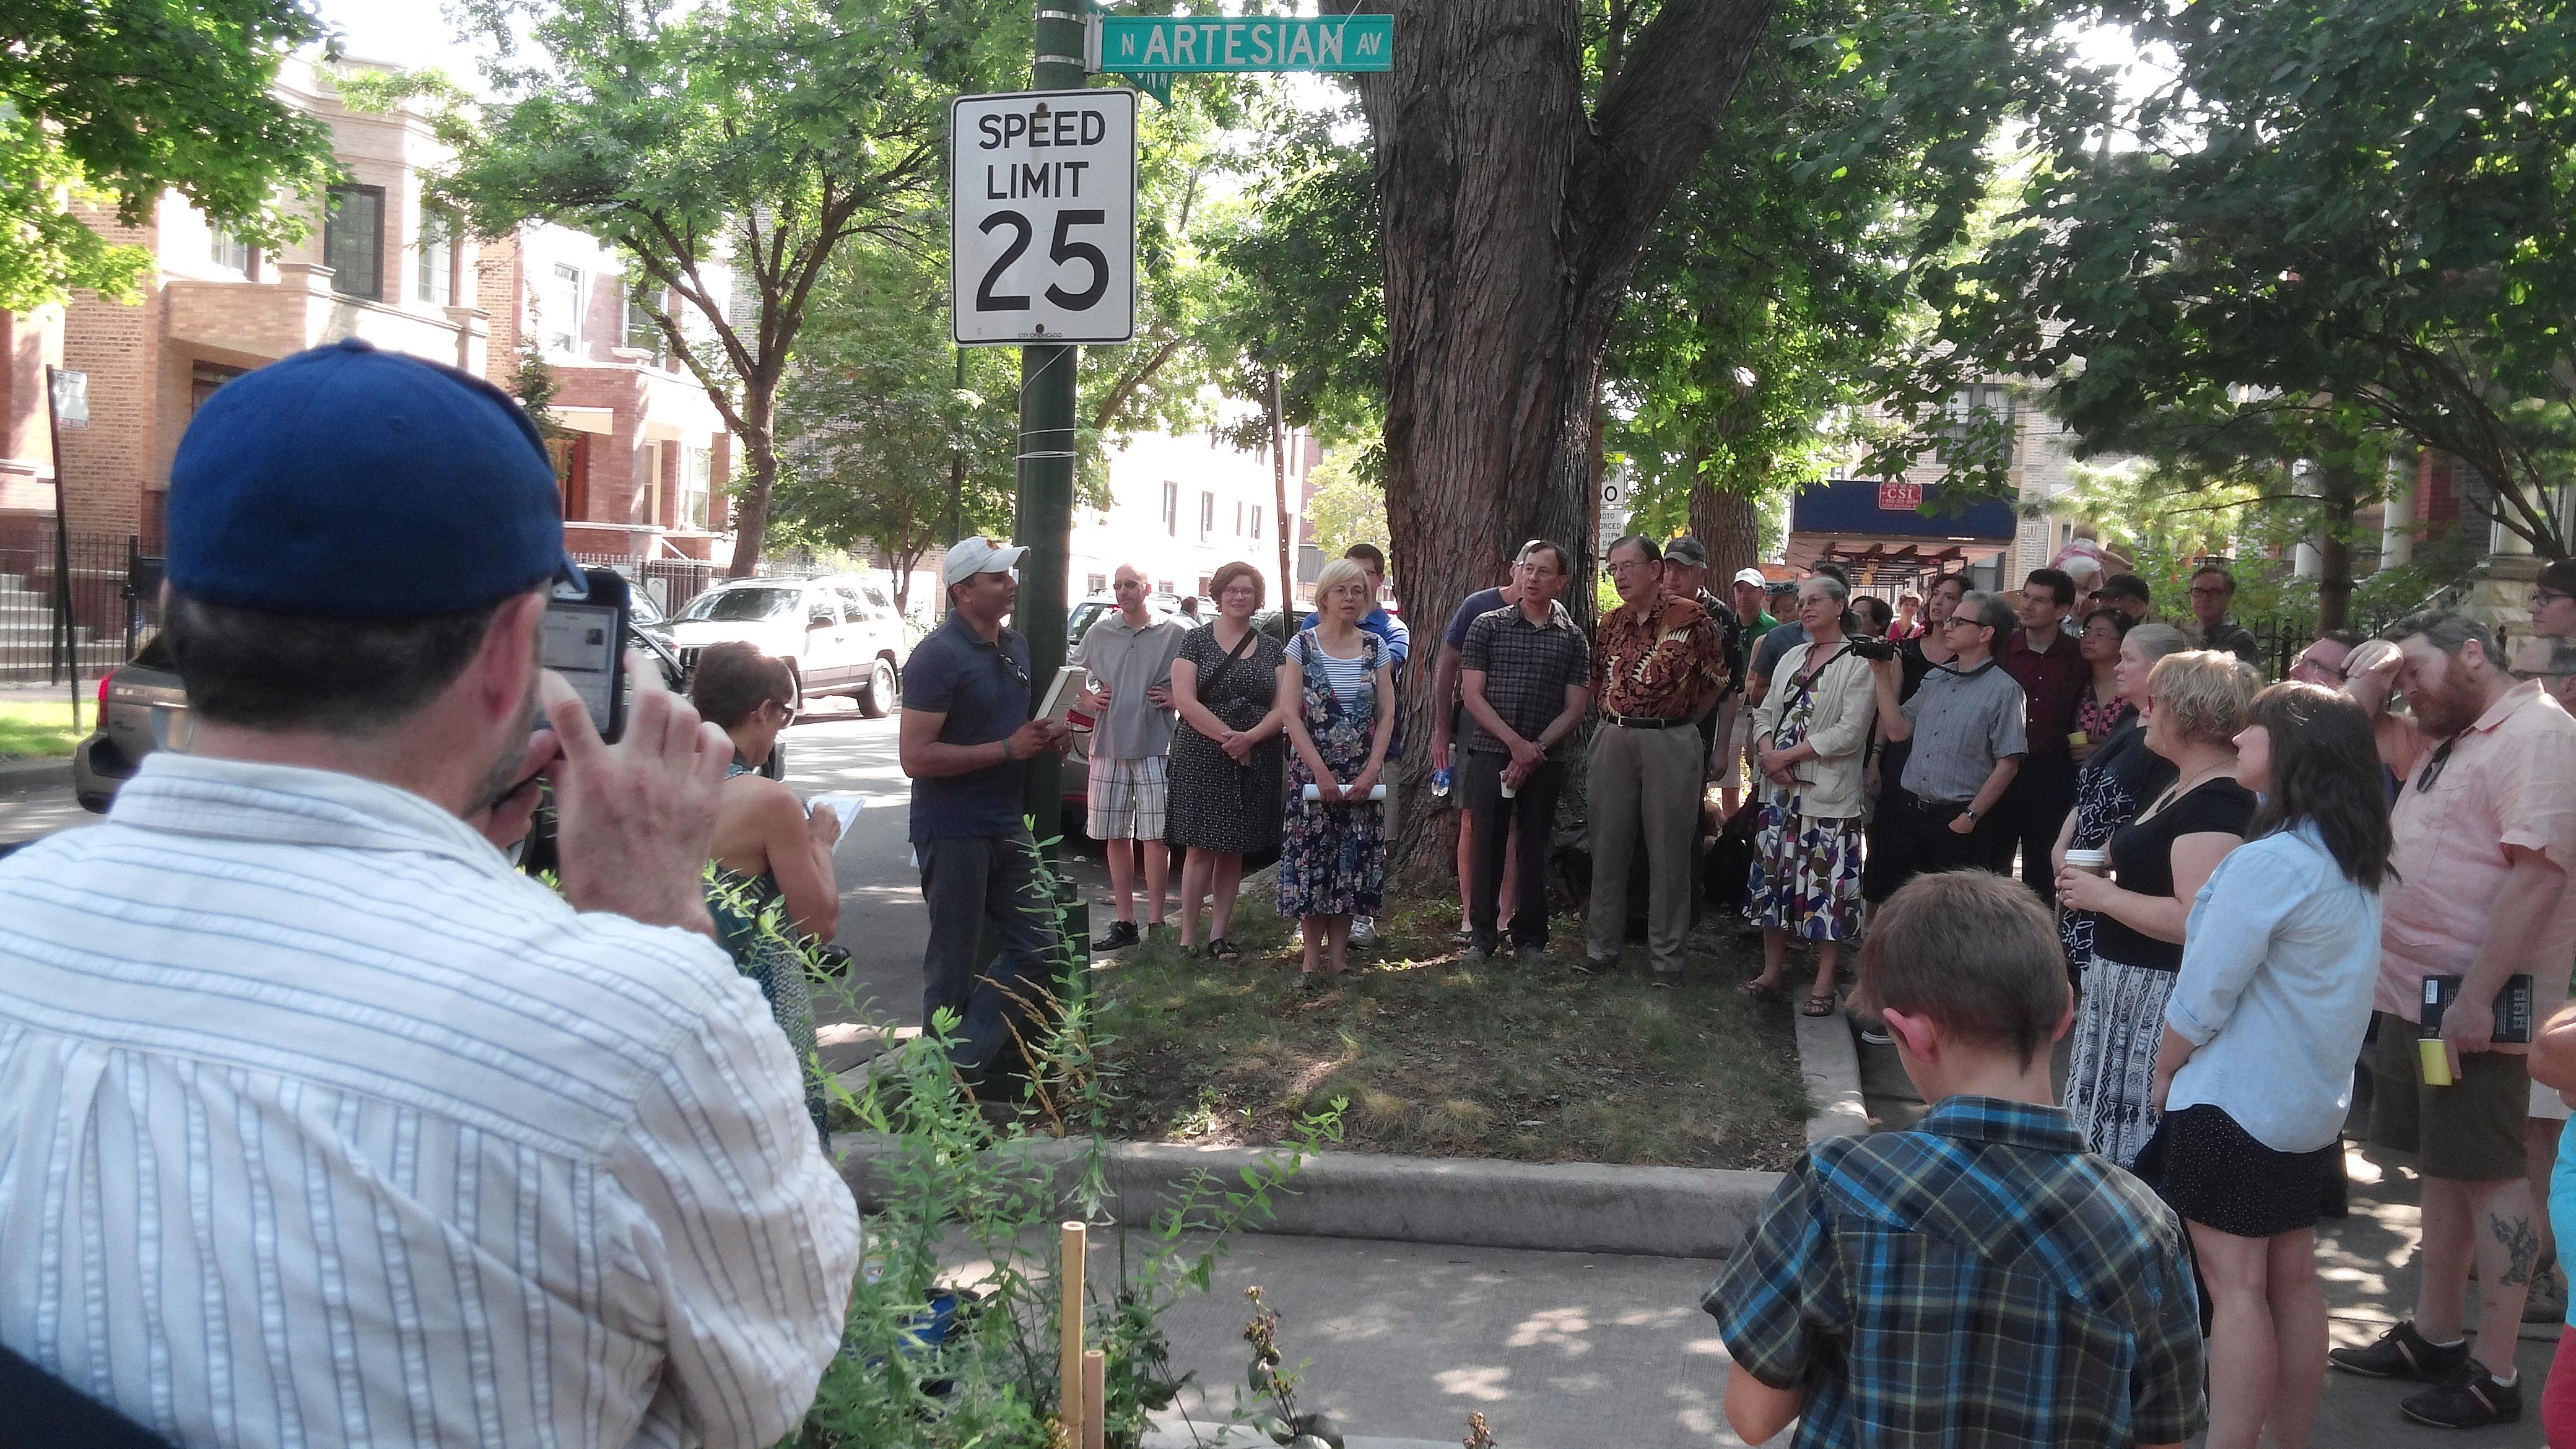 Crowd at Lee Sandlin Way - August 2015